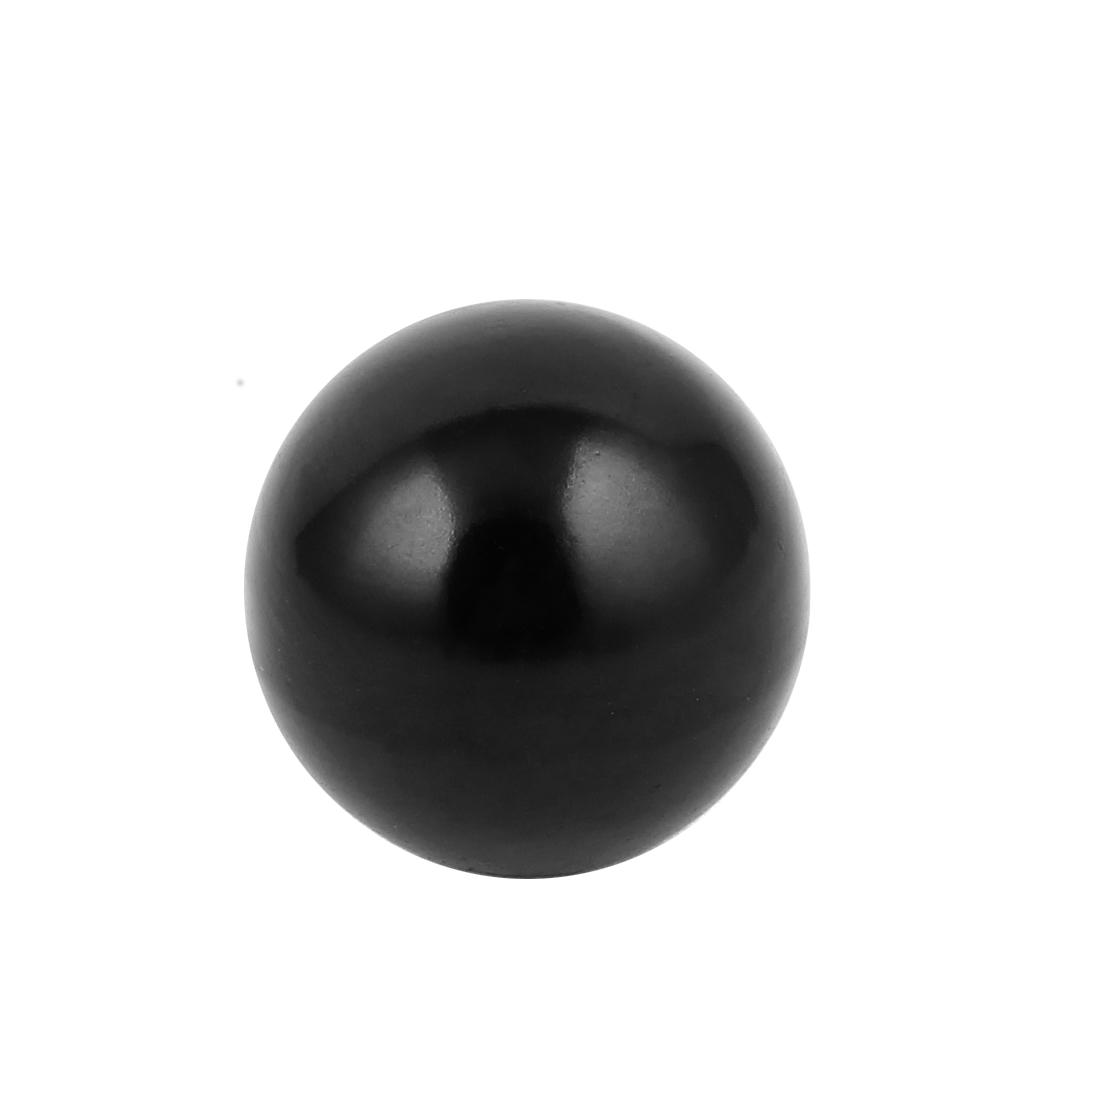 Black Plastic Round 50mm Diameter 12mm Threaded Ball Lever Knob